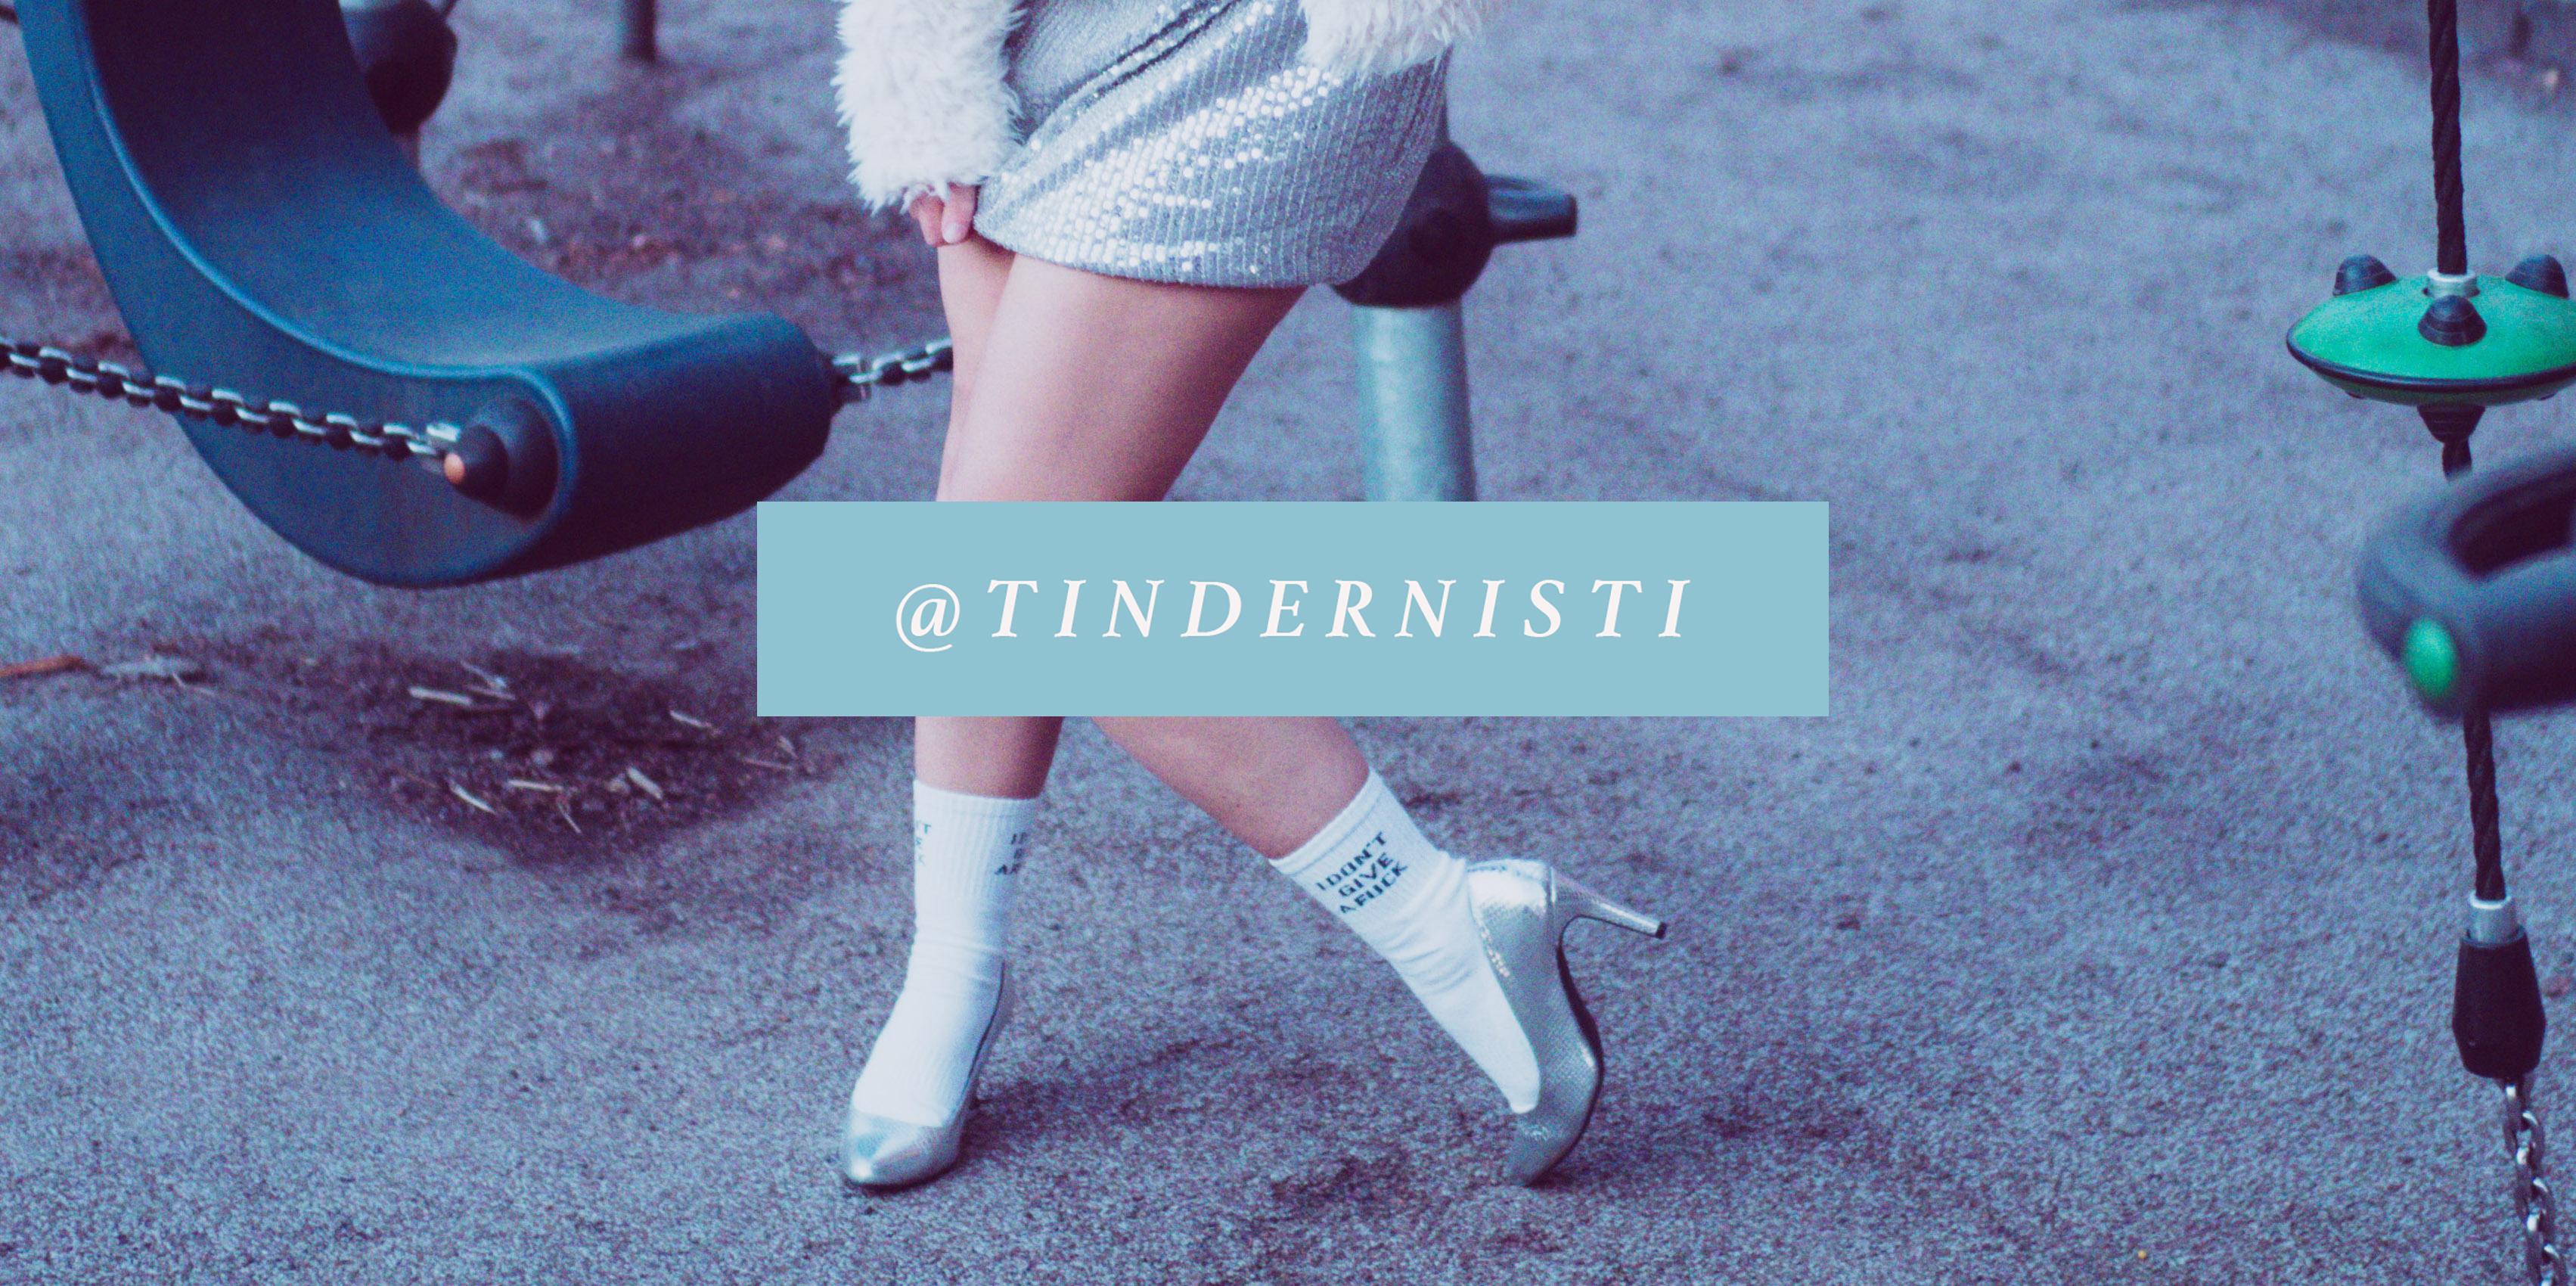 @tindernisti